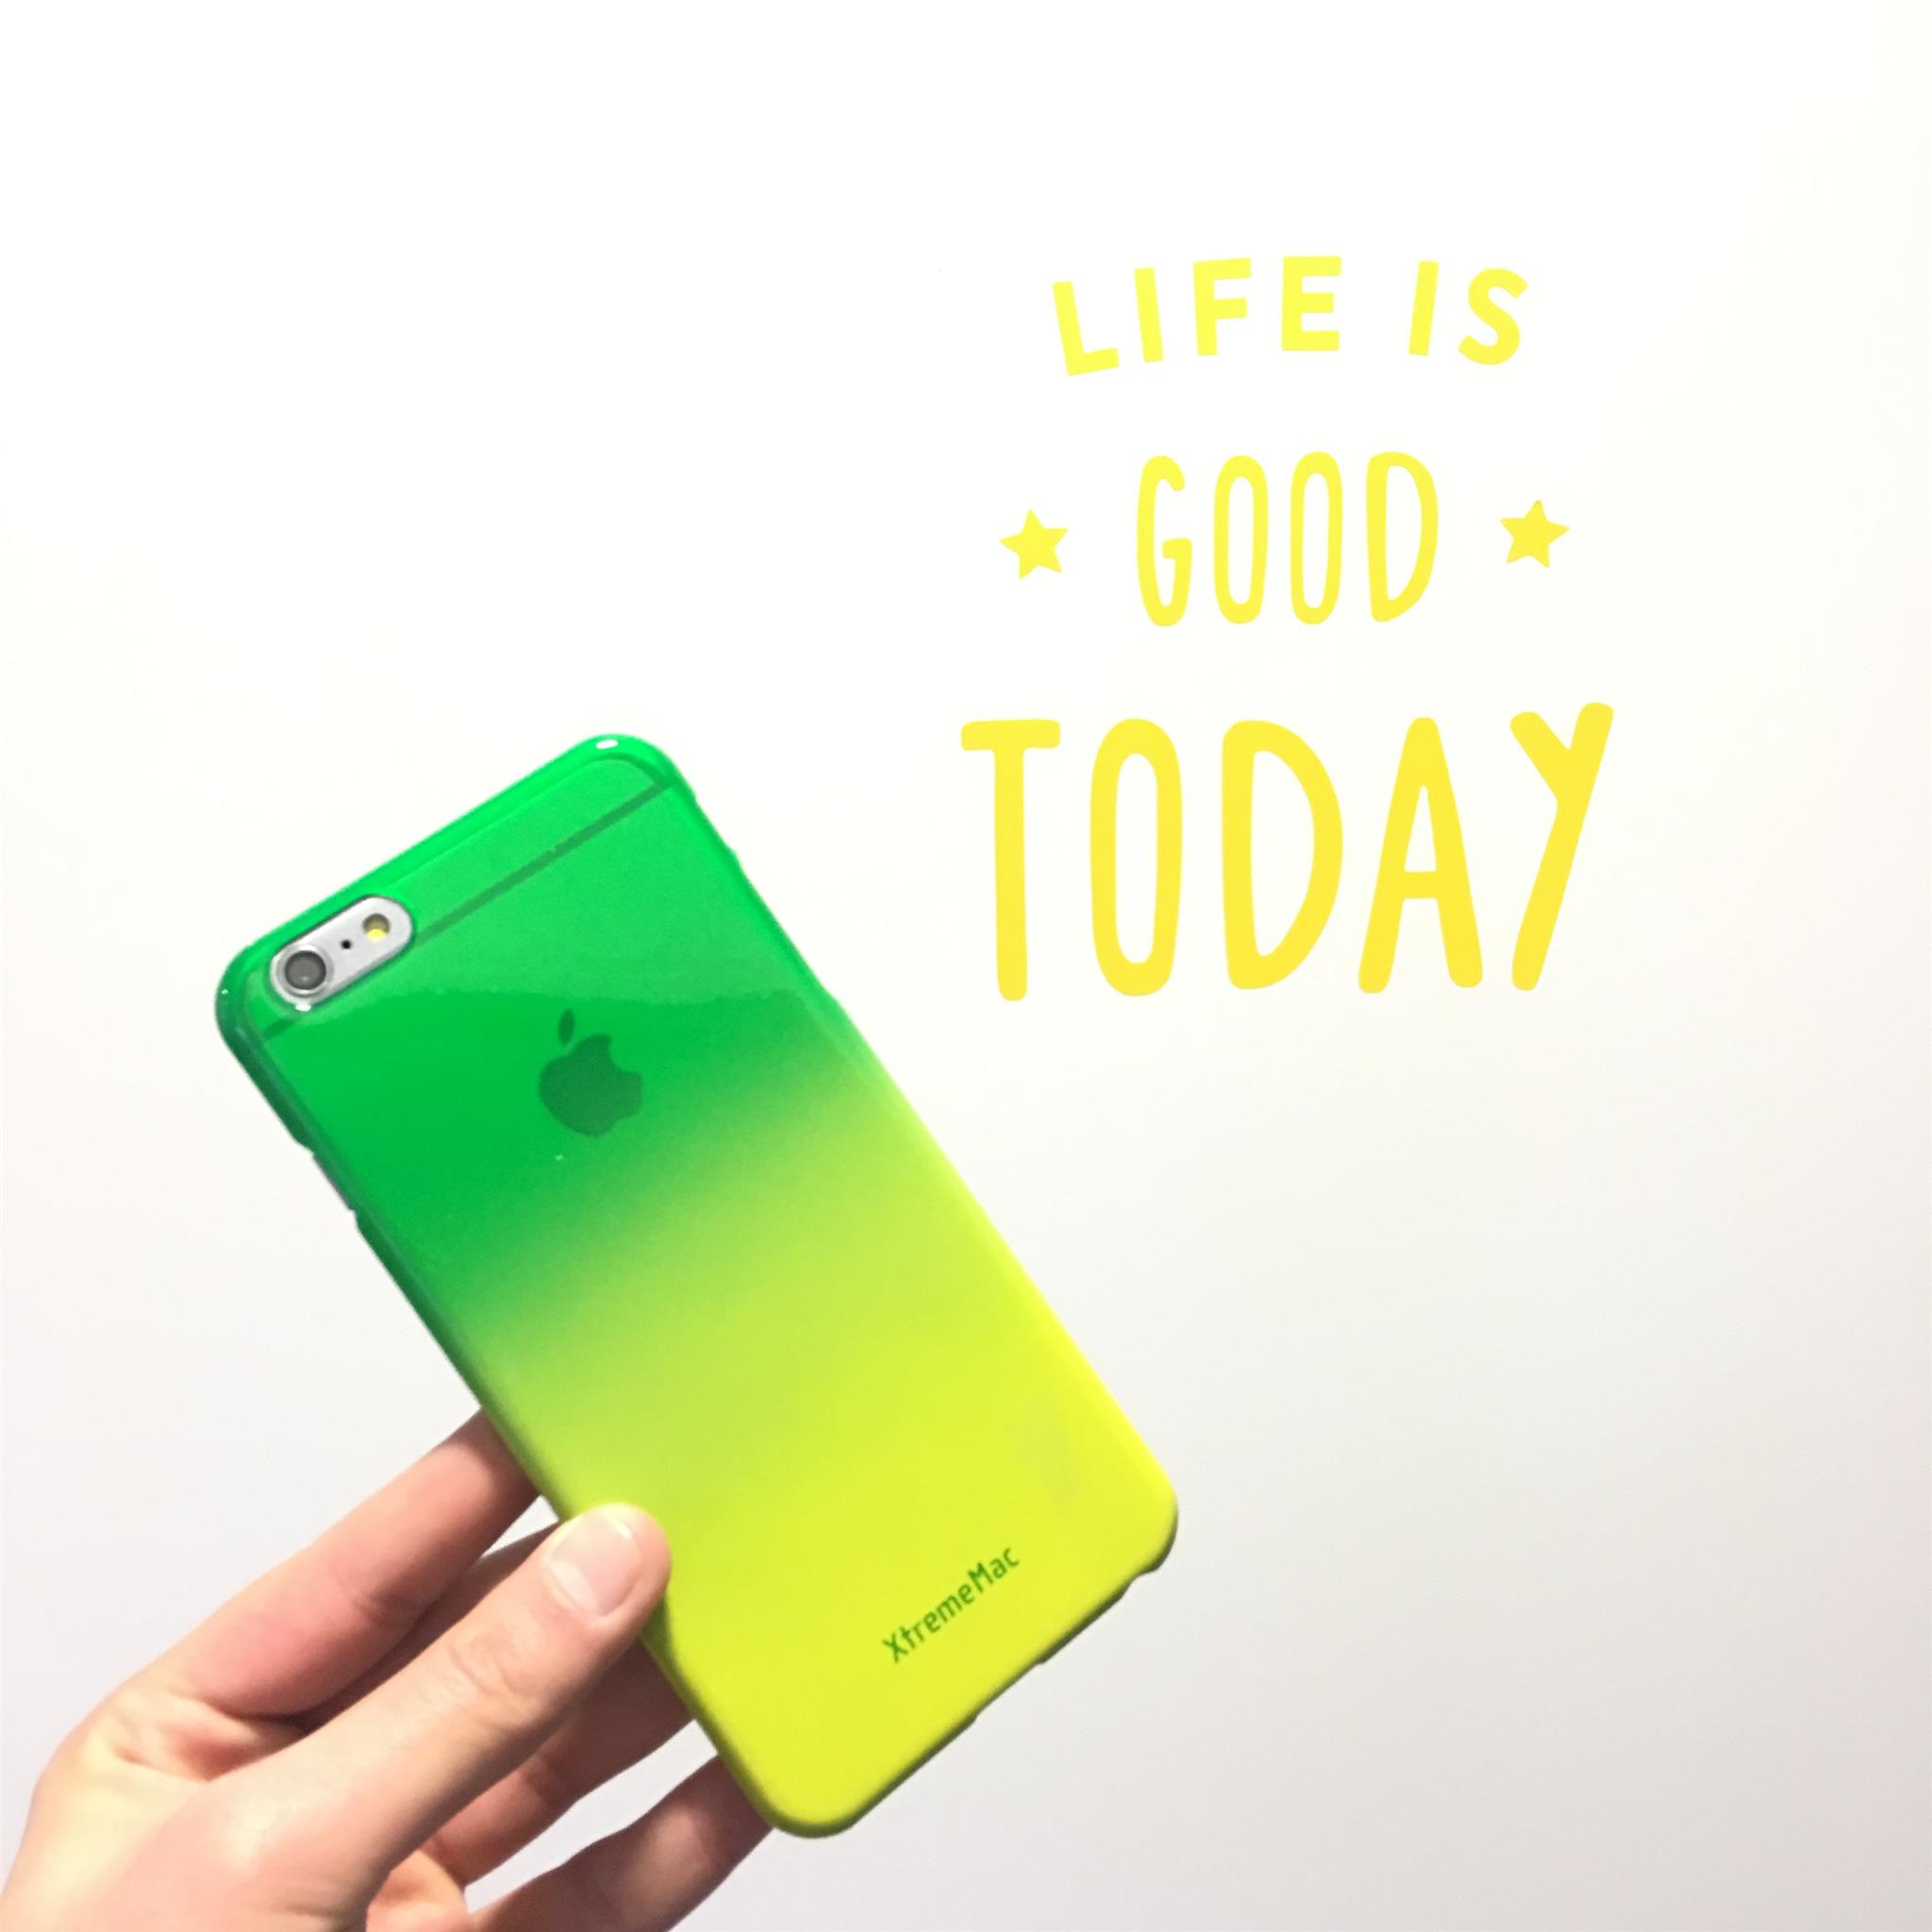 Coque pour iPhone 6+ Microshield fade verte et jaune XtremeMac